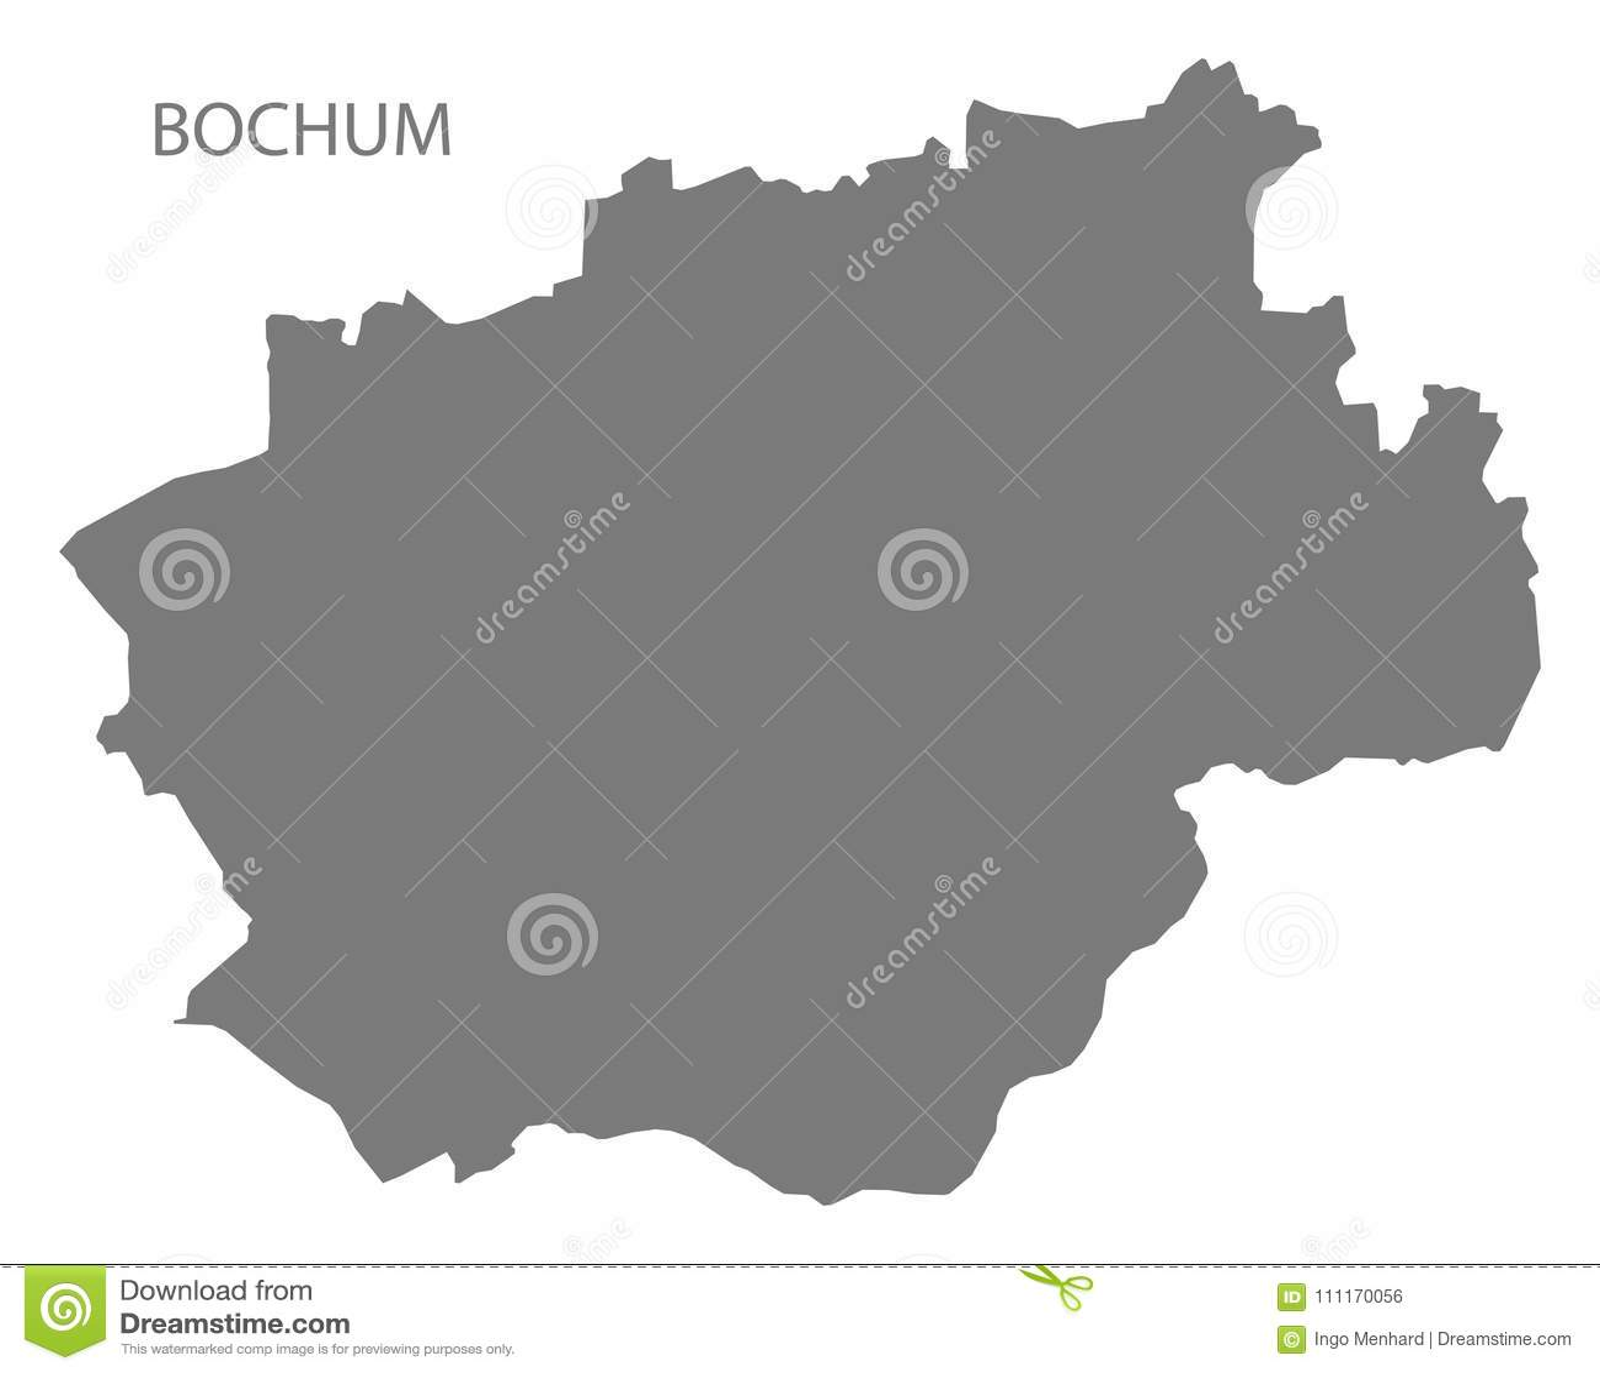 Bochum City Map Grey Illustration Silhouette Shape Stock Vector